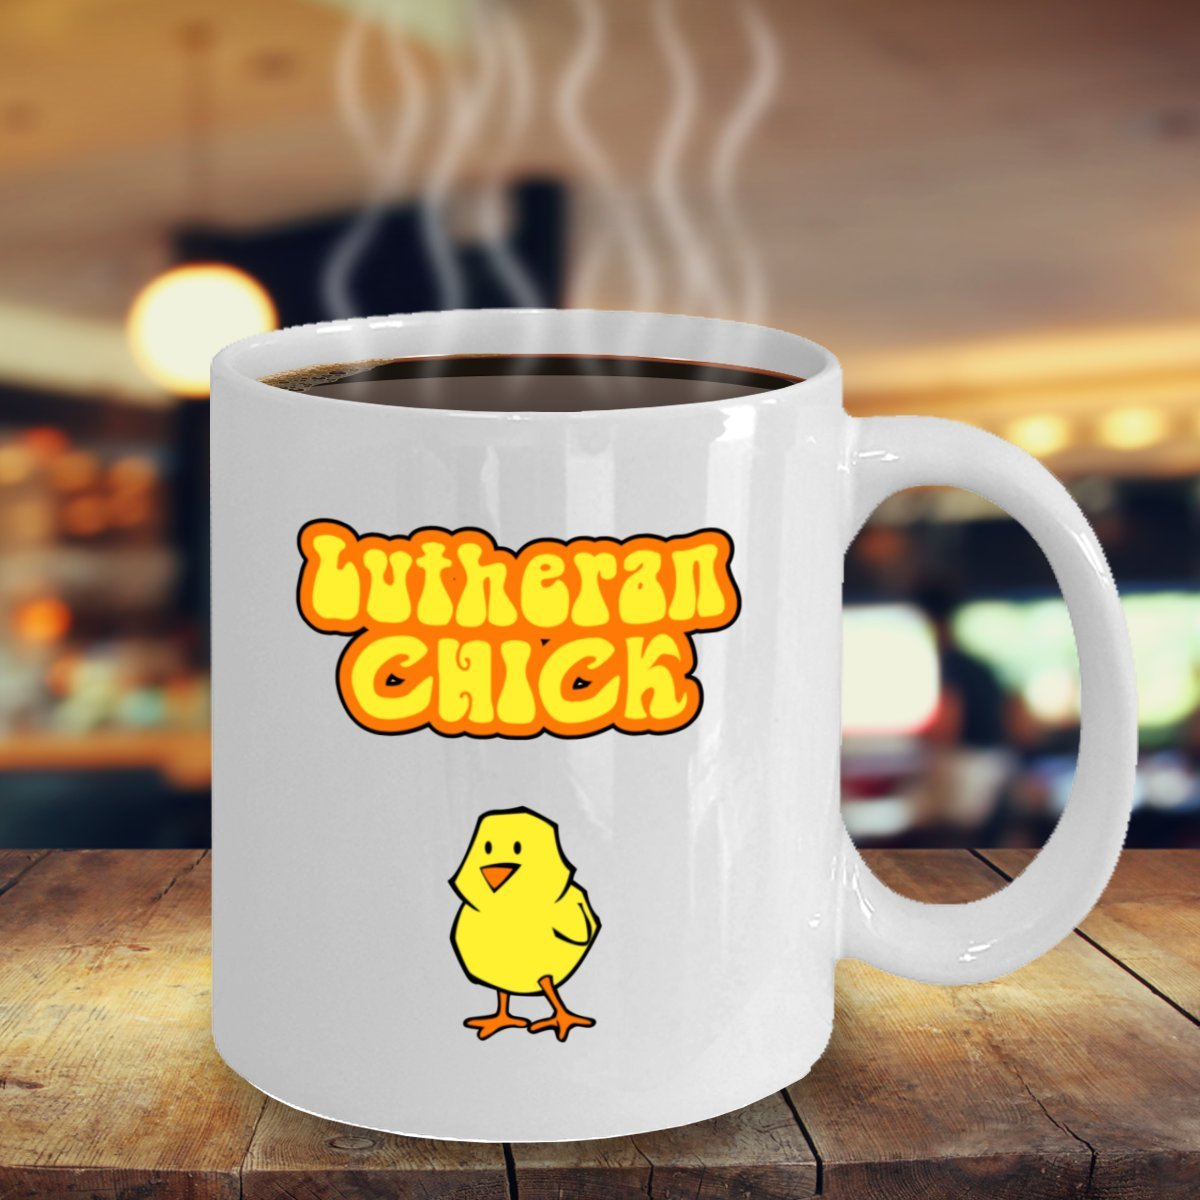 Lutheran Chick Gift Coffee Mug